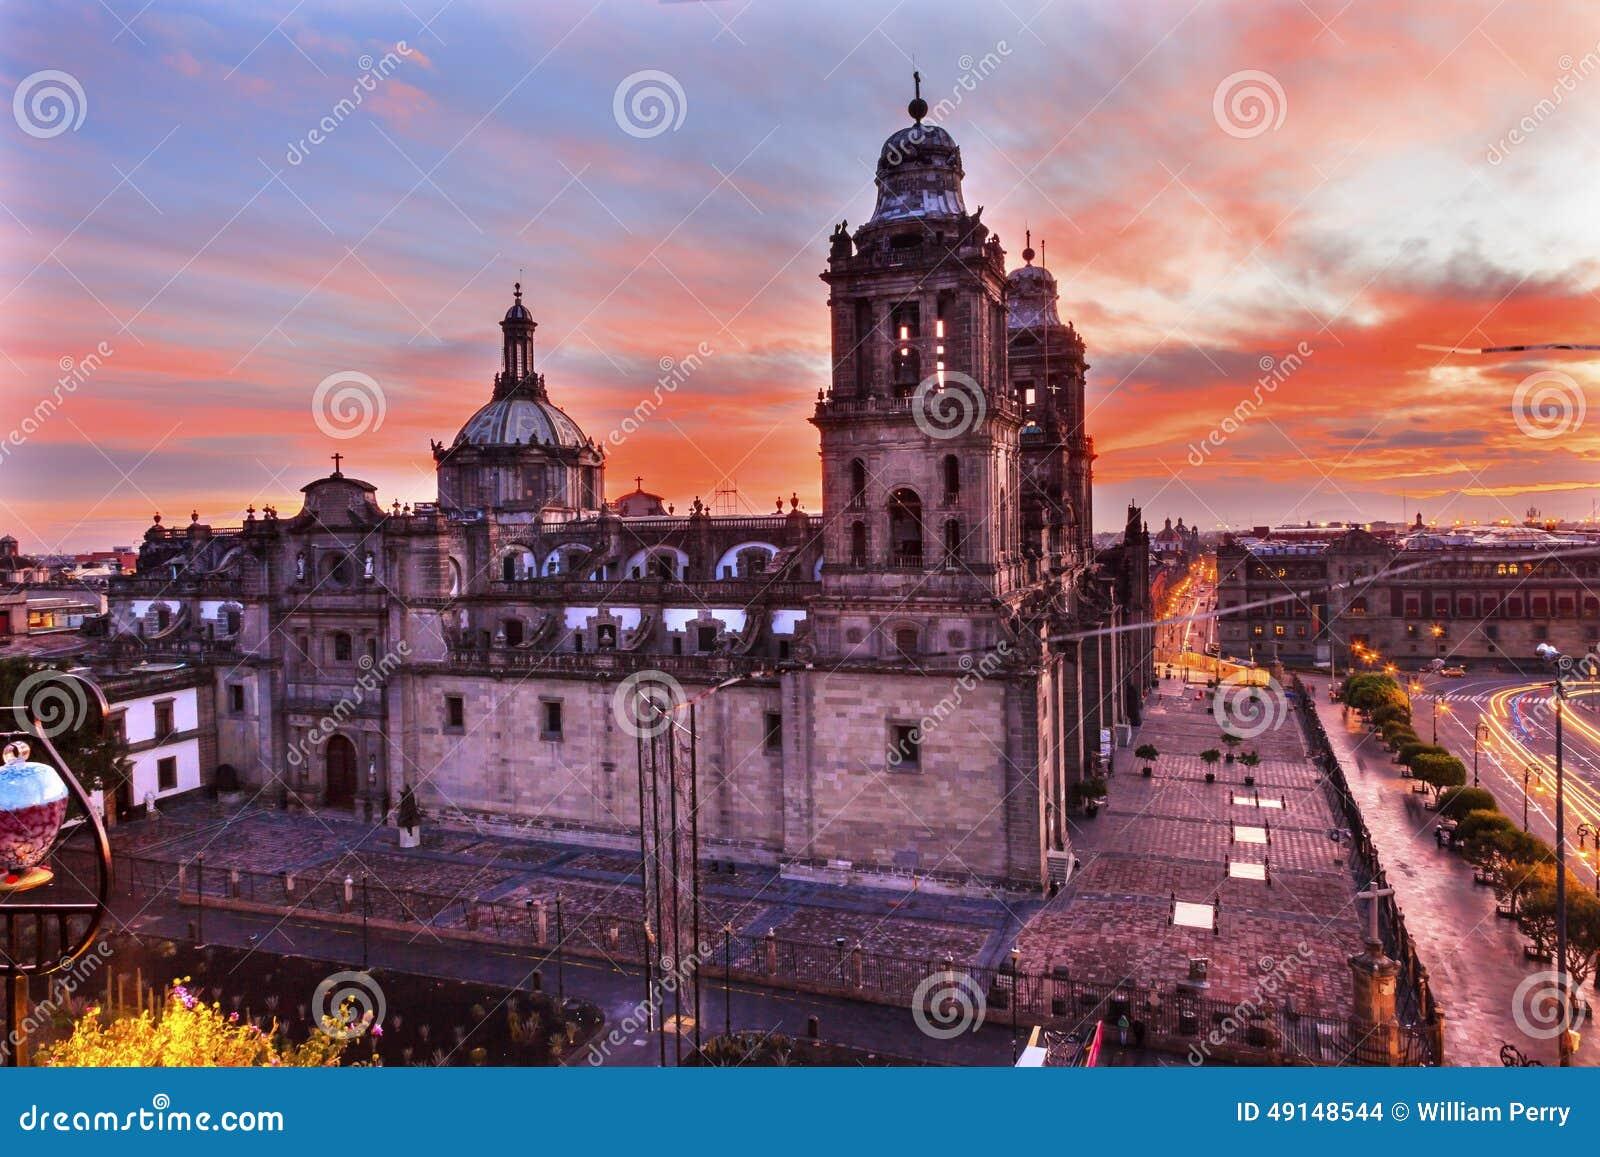 Landmark Of Mexico City Metropolitan Cathedral